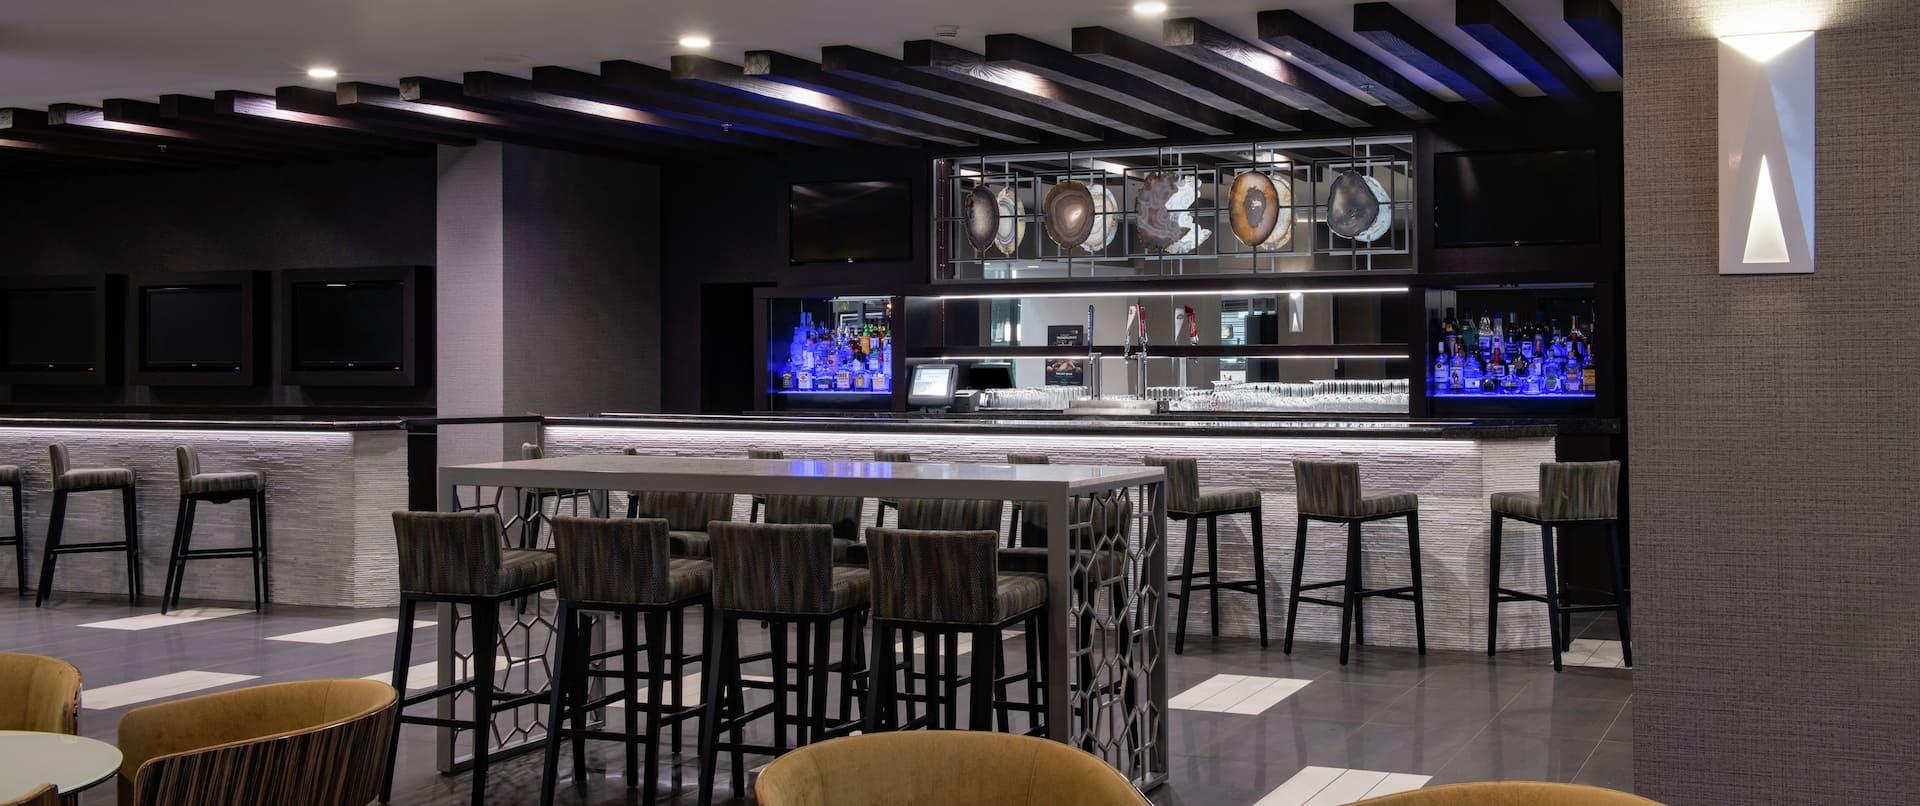 Three Palms Restaurant and Bar